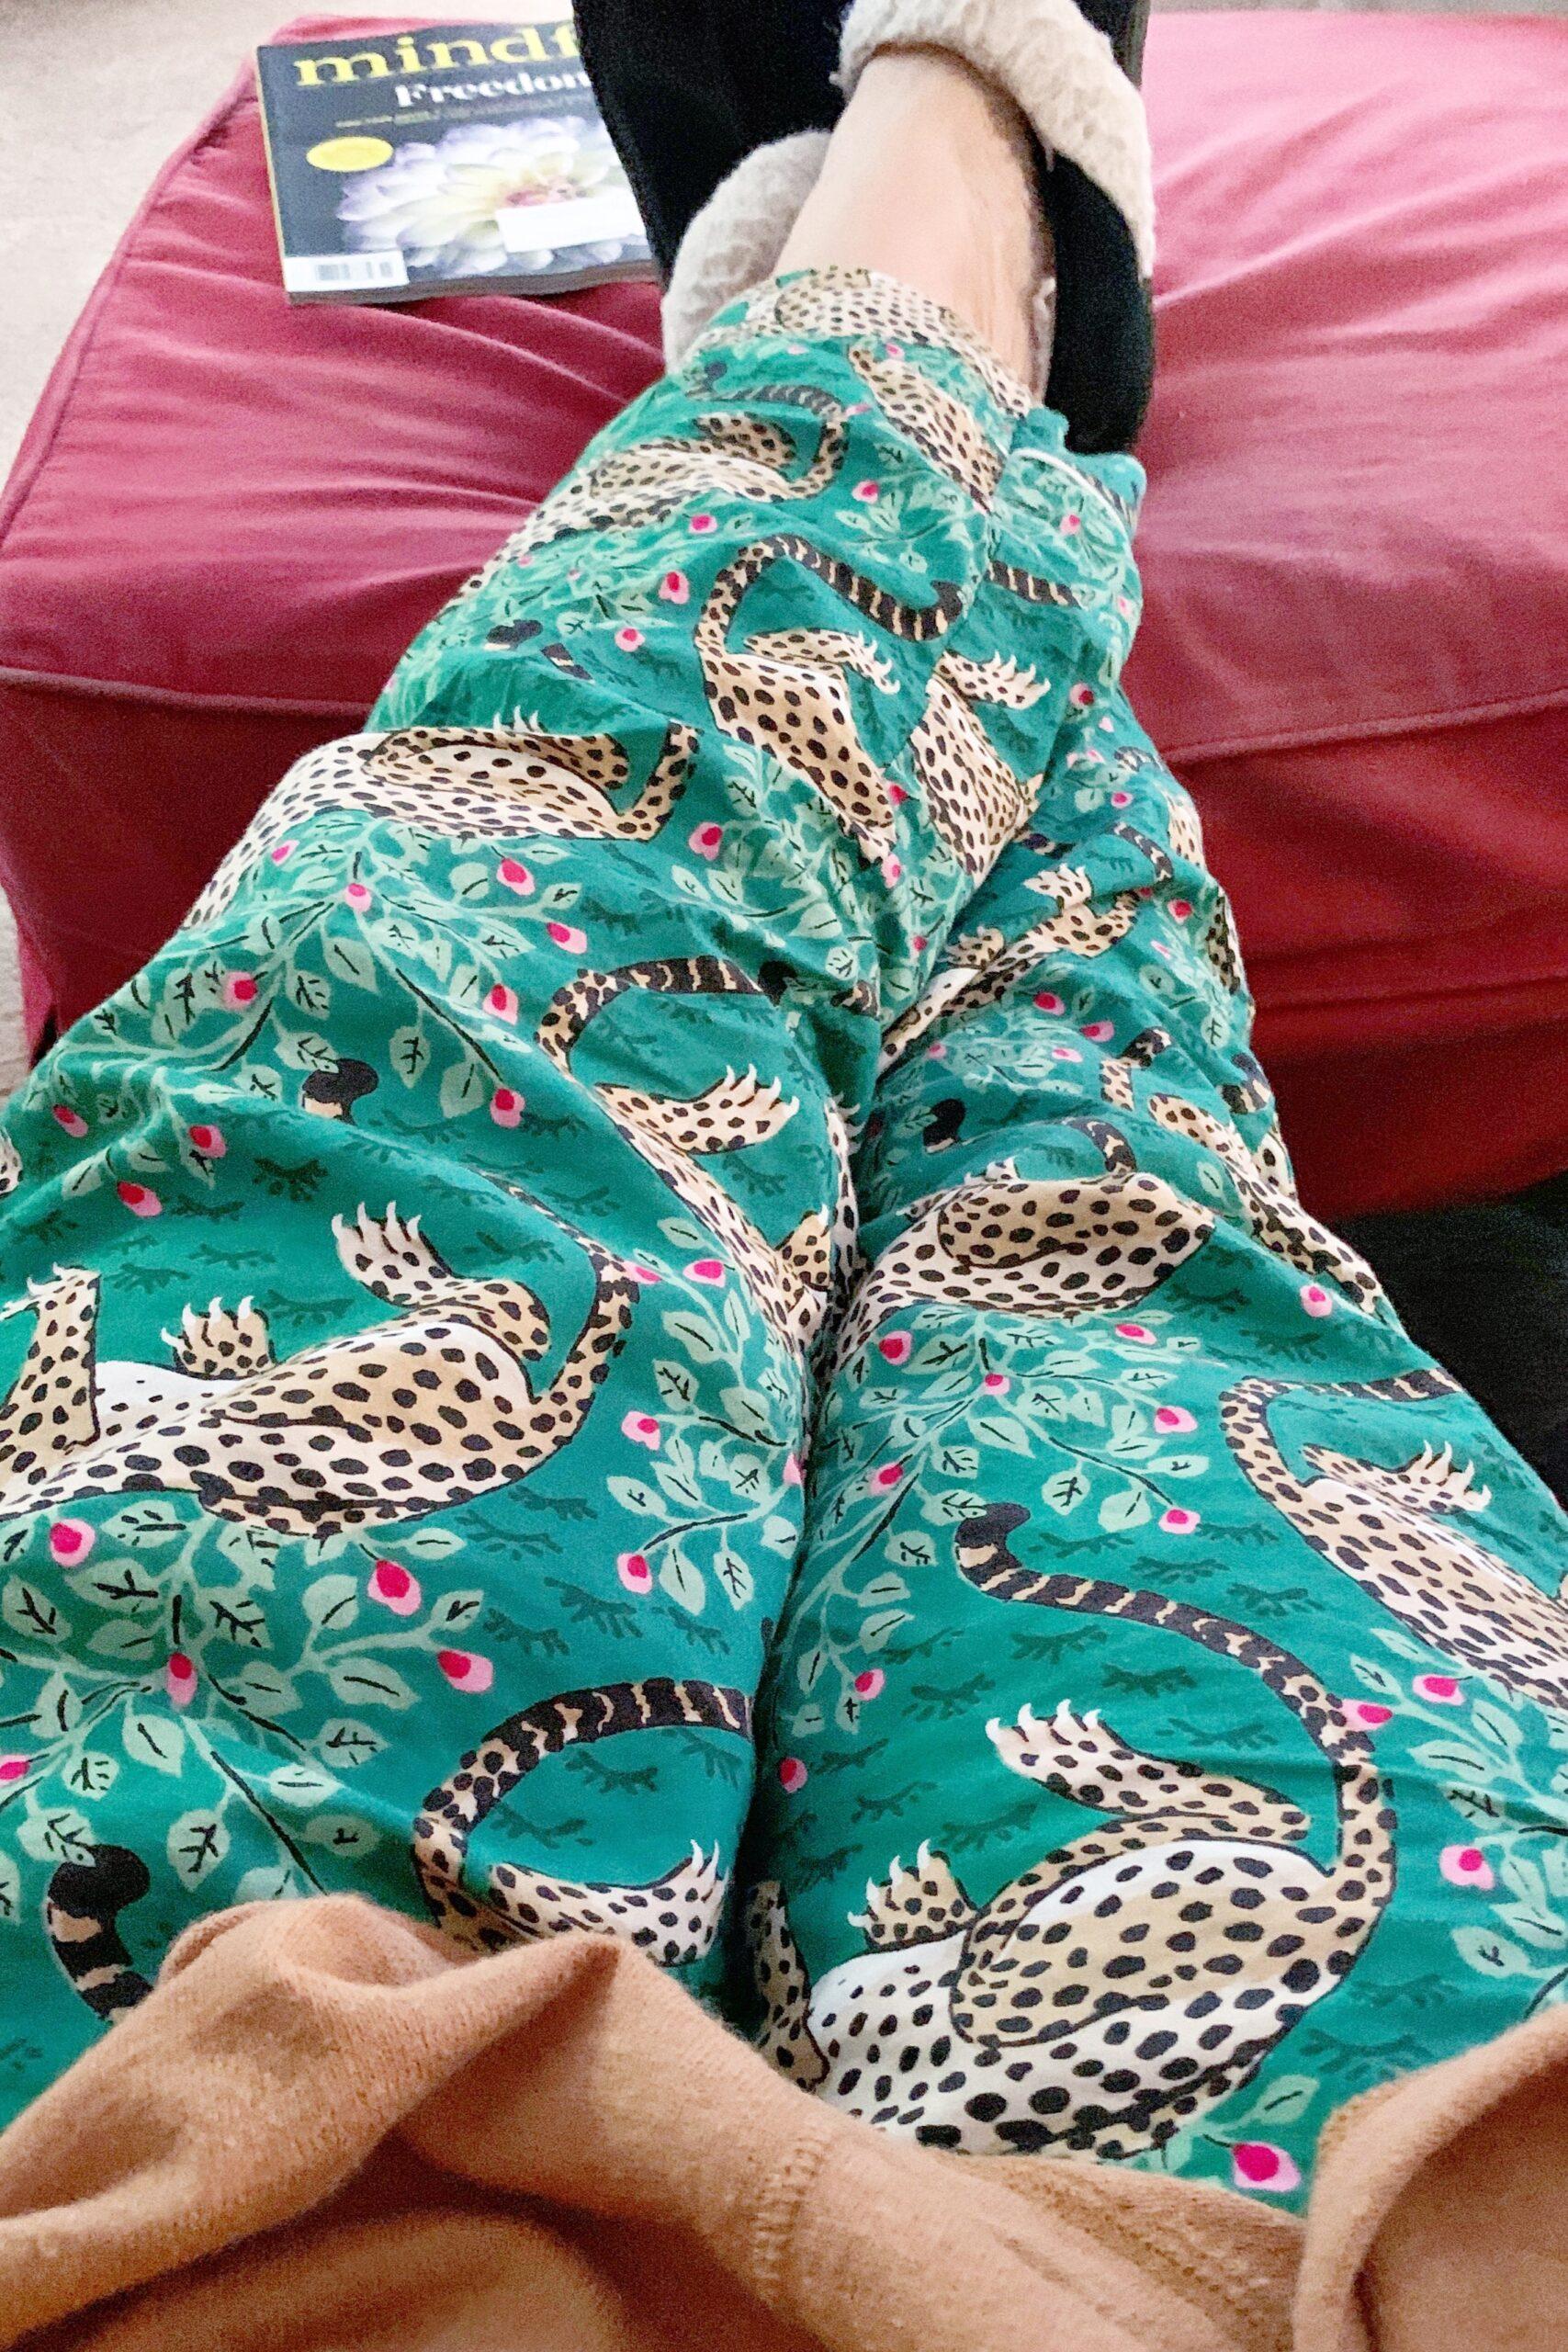 Green leopard Printfresh pajama pants